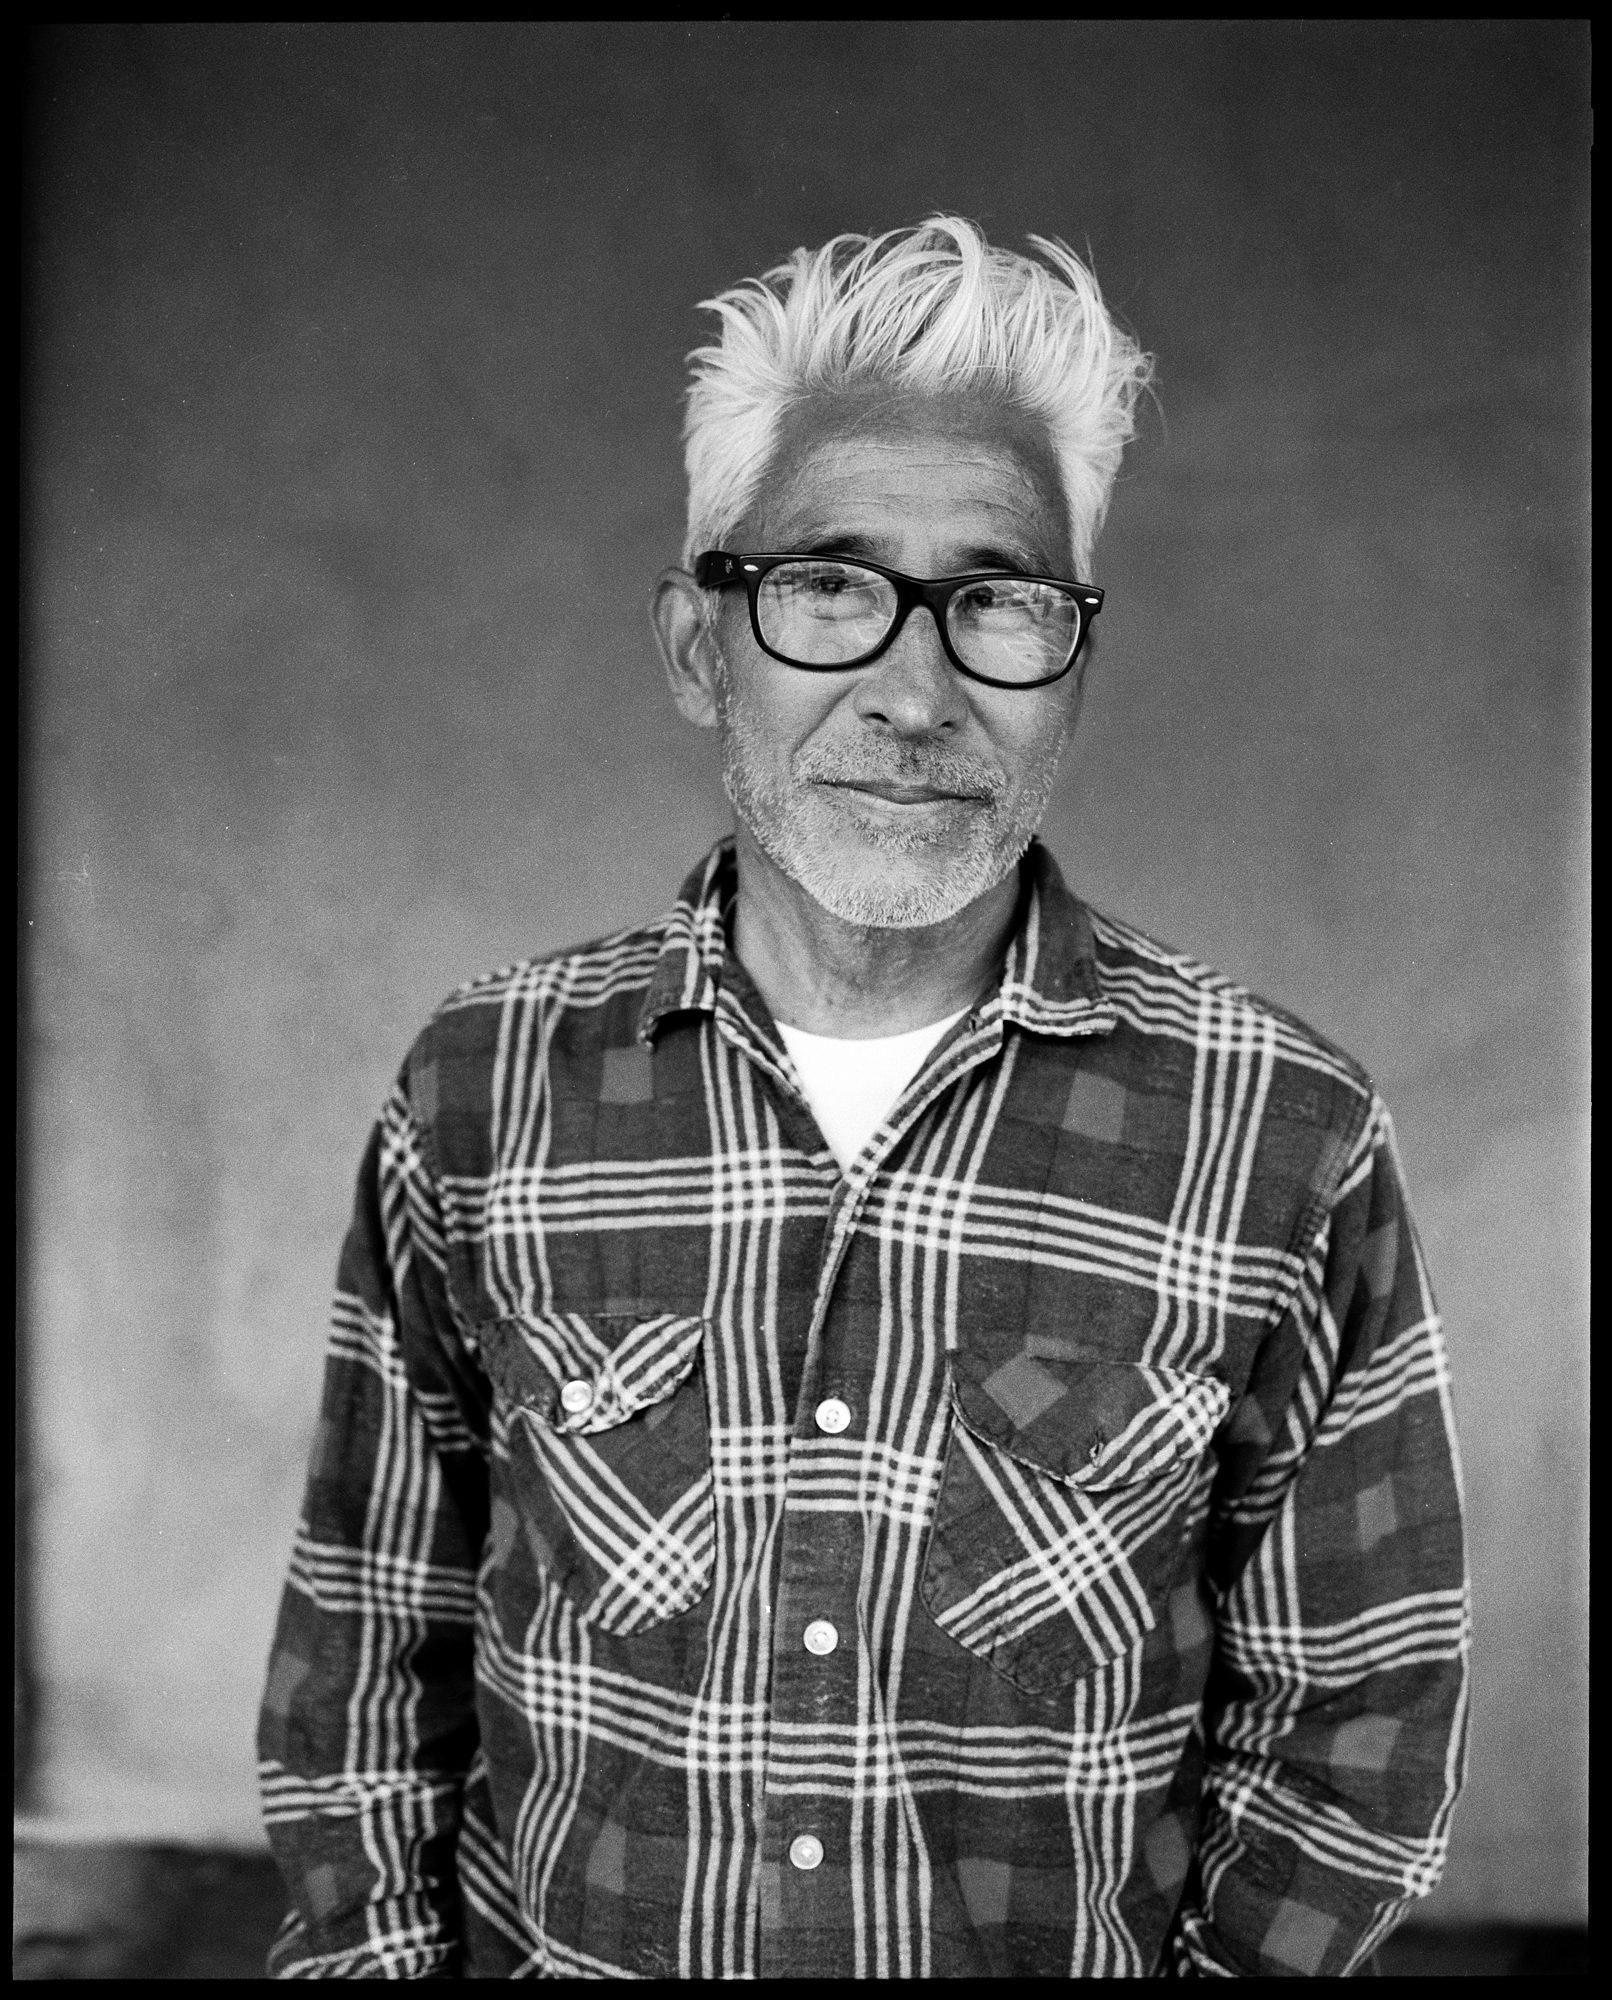 Portrair of Yoki from Yokishop - by Brett Hillyard on ILFORD black and white HP5+ Film